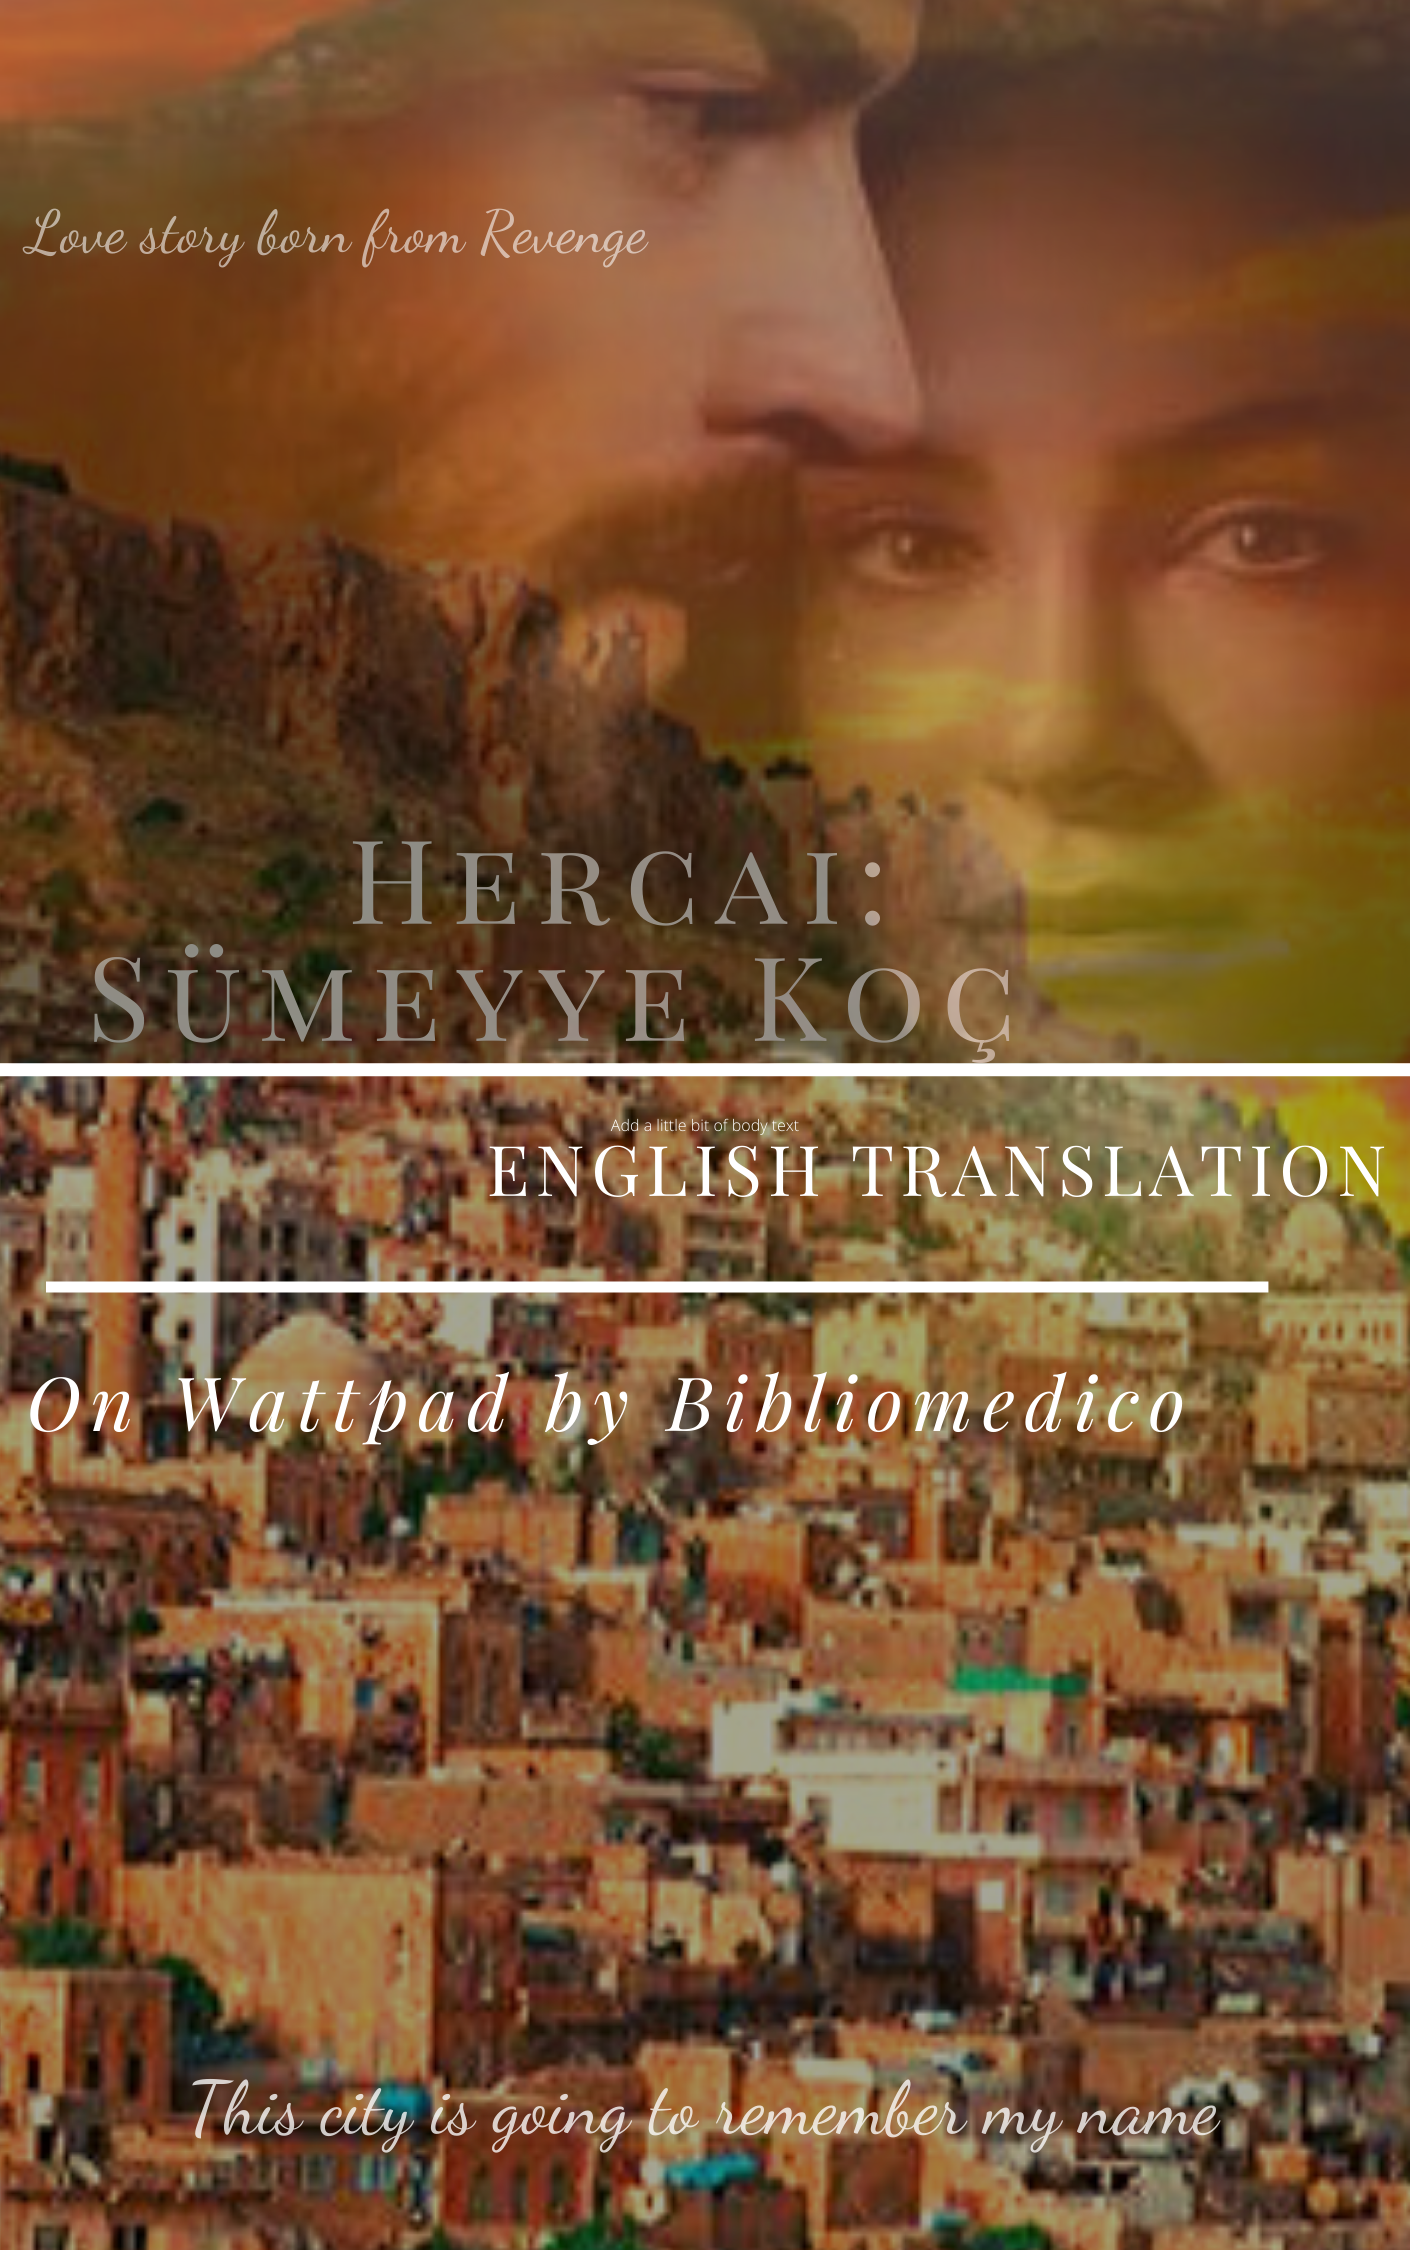 Hercai English Translation Ch6 5 English Translation English Translation